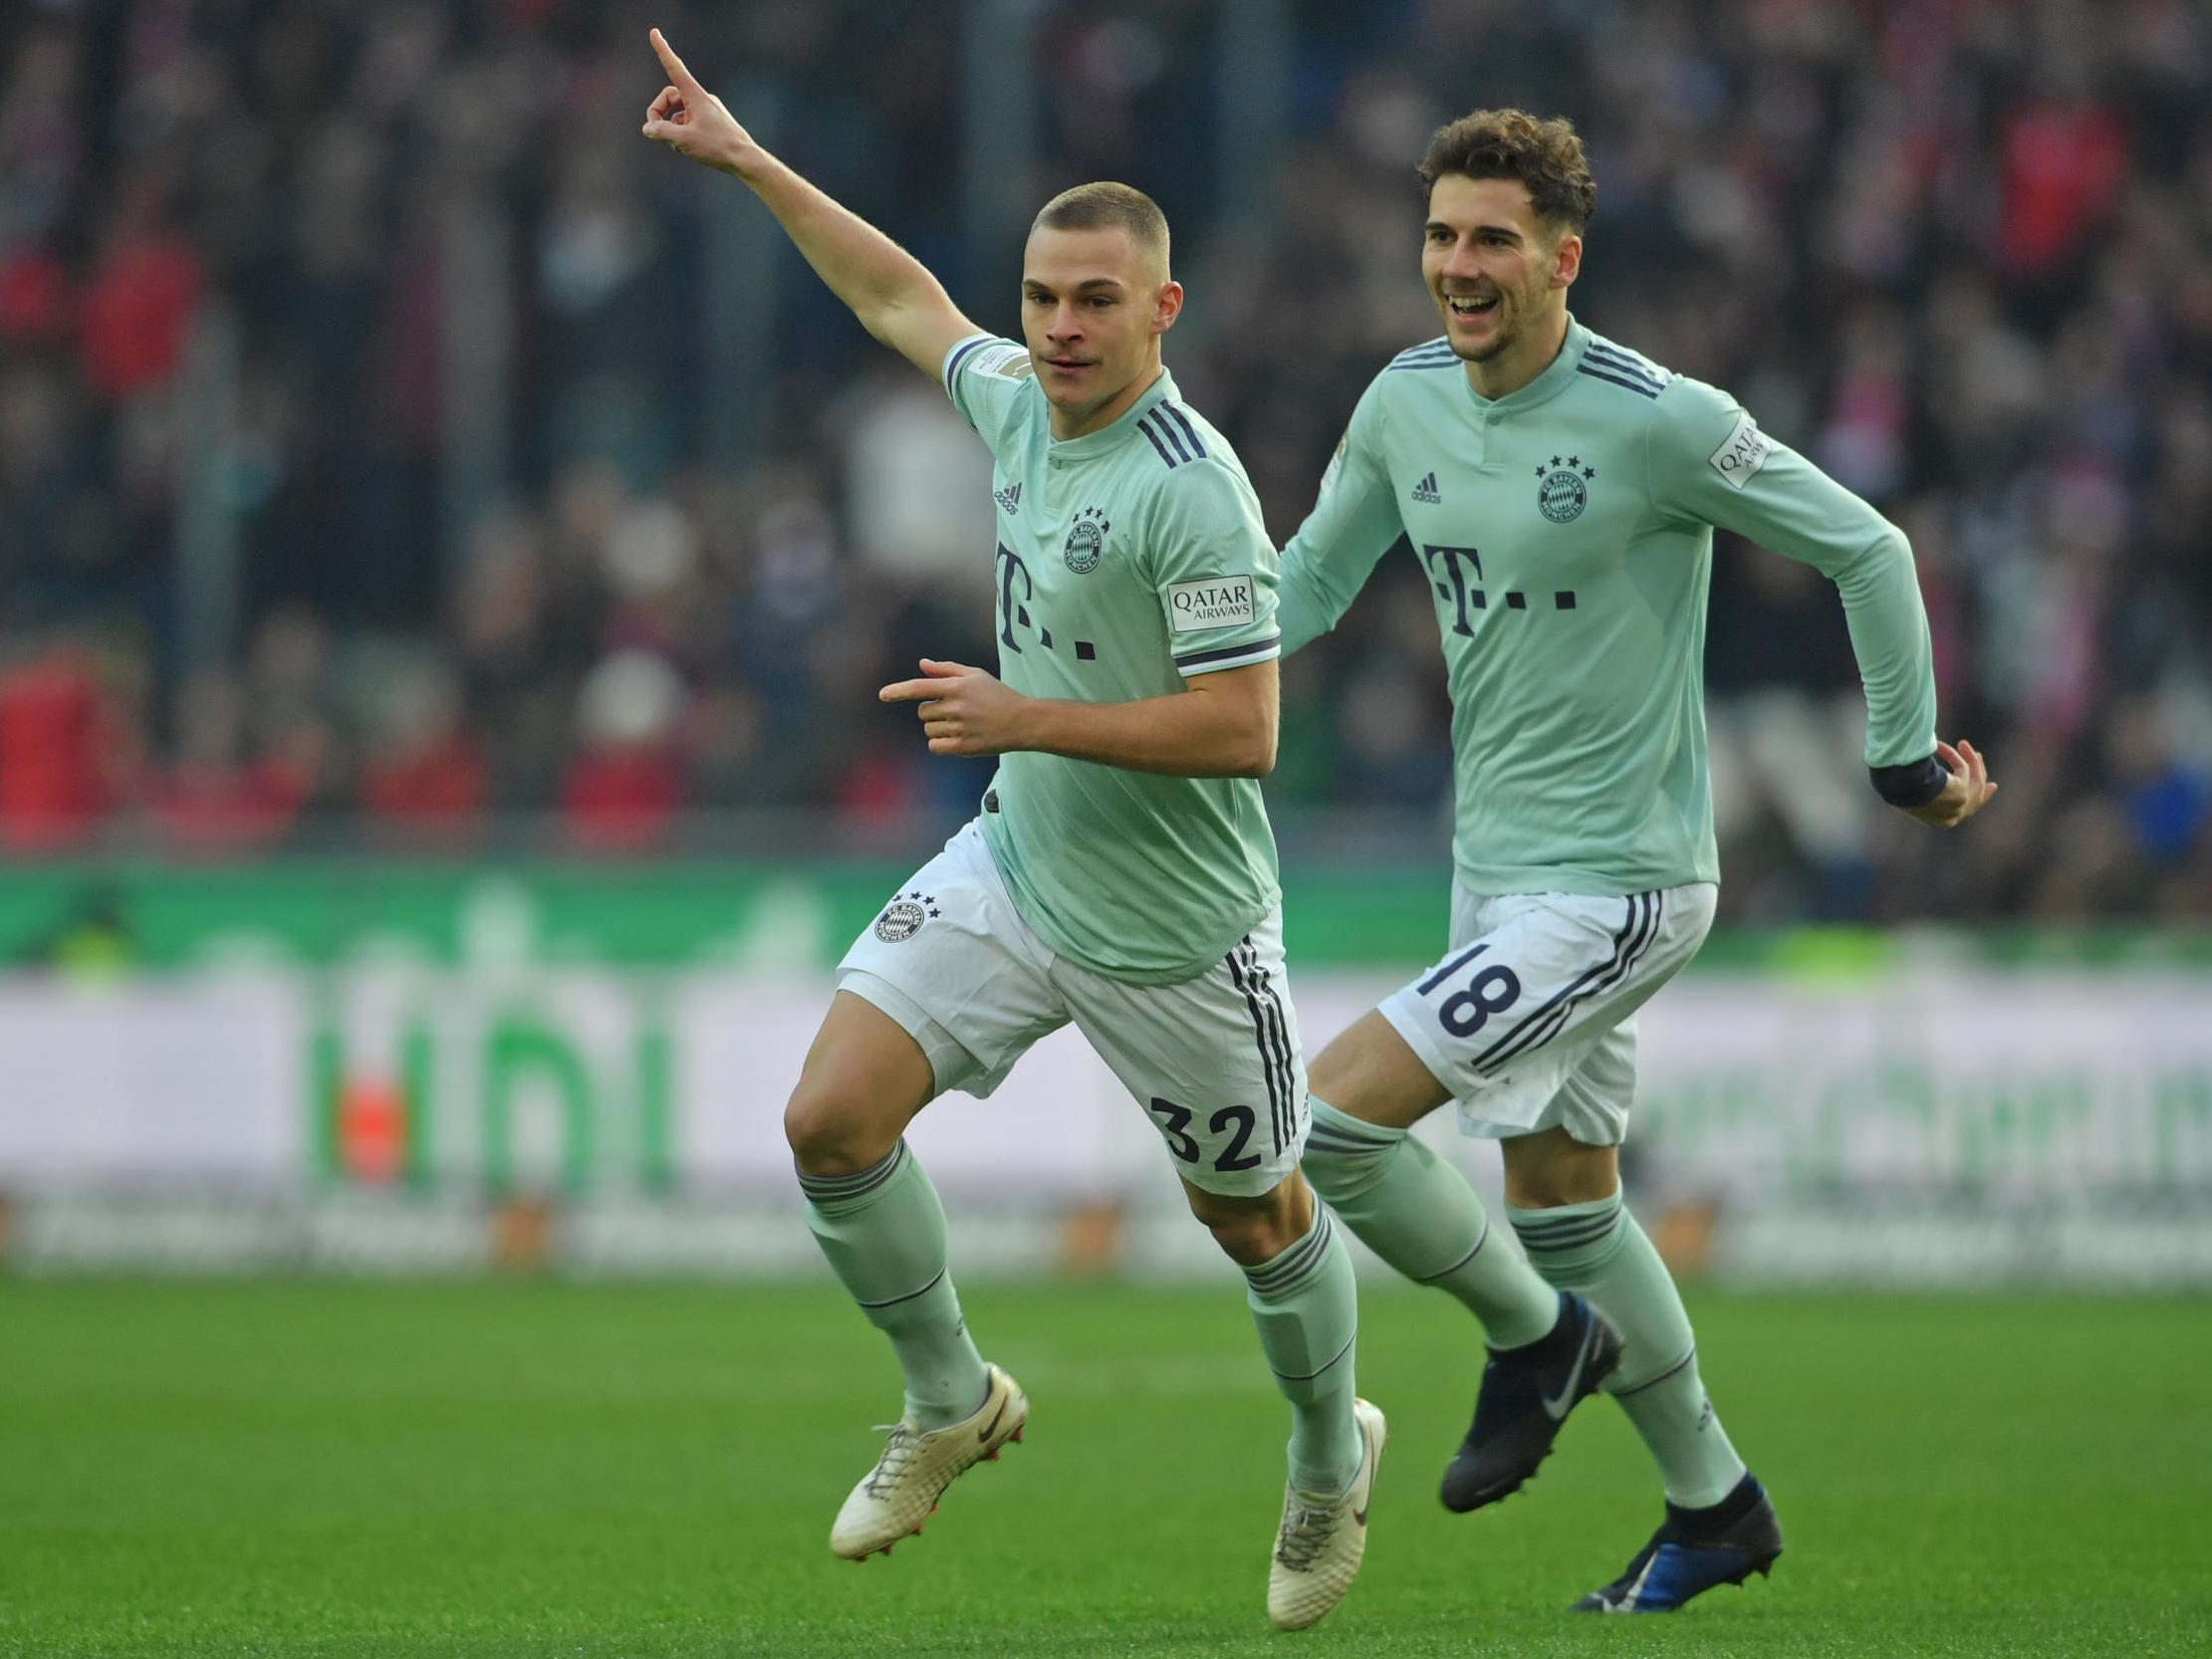 c073eea1c8 Joshua Kimmich celebrates scoring for Bayern vs Hannover (Bongarts Getty)